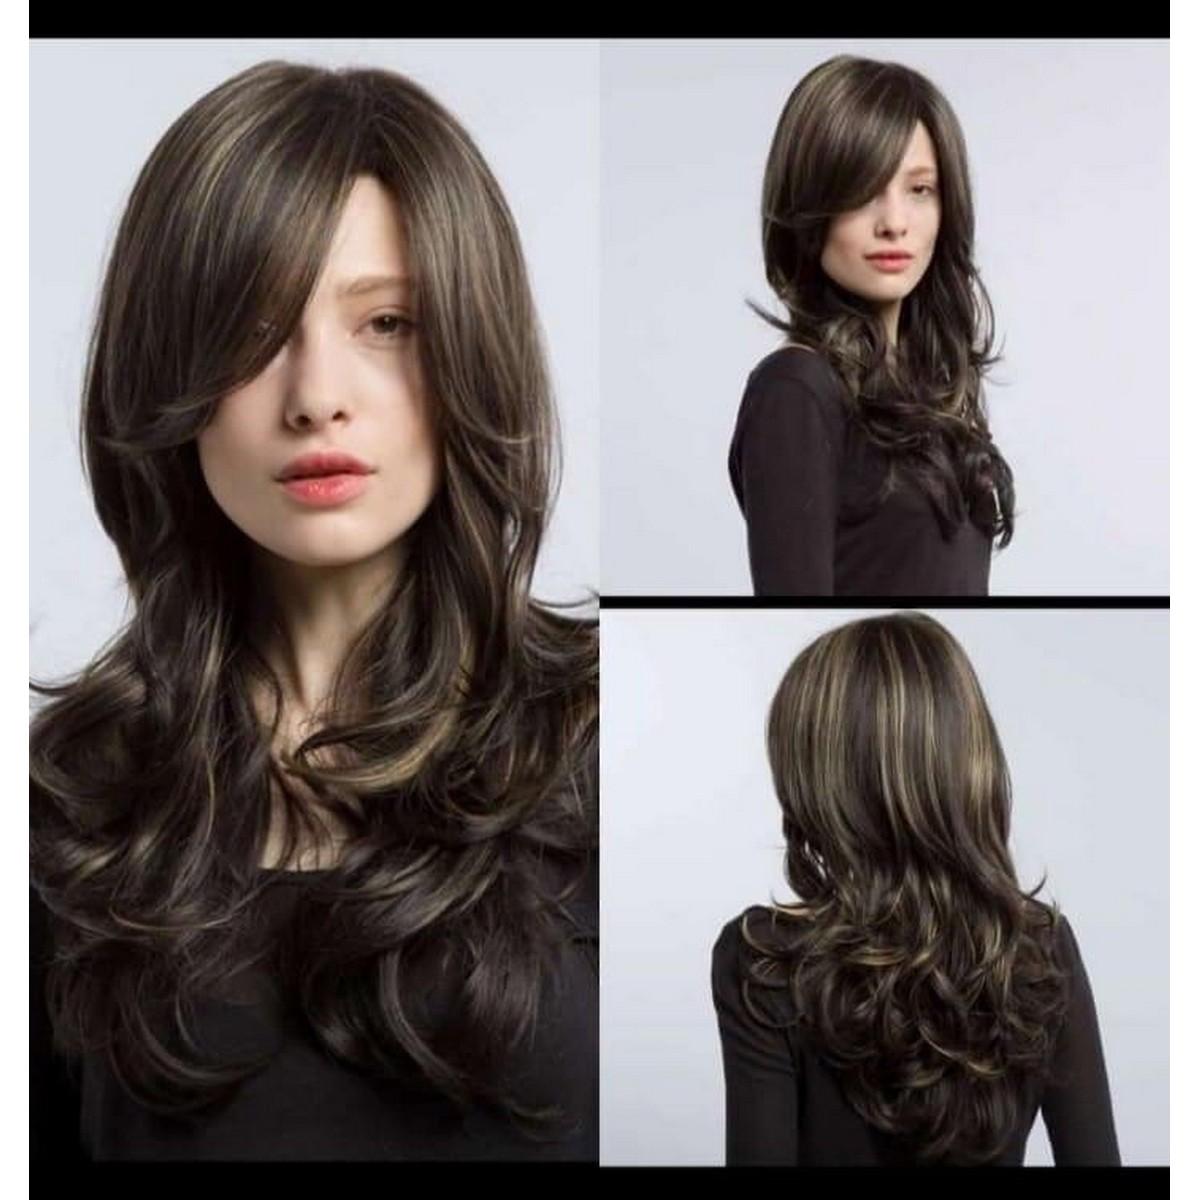 New kashees full head wig-Natural hairs color